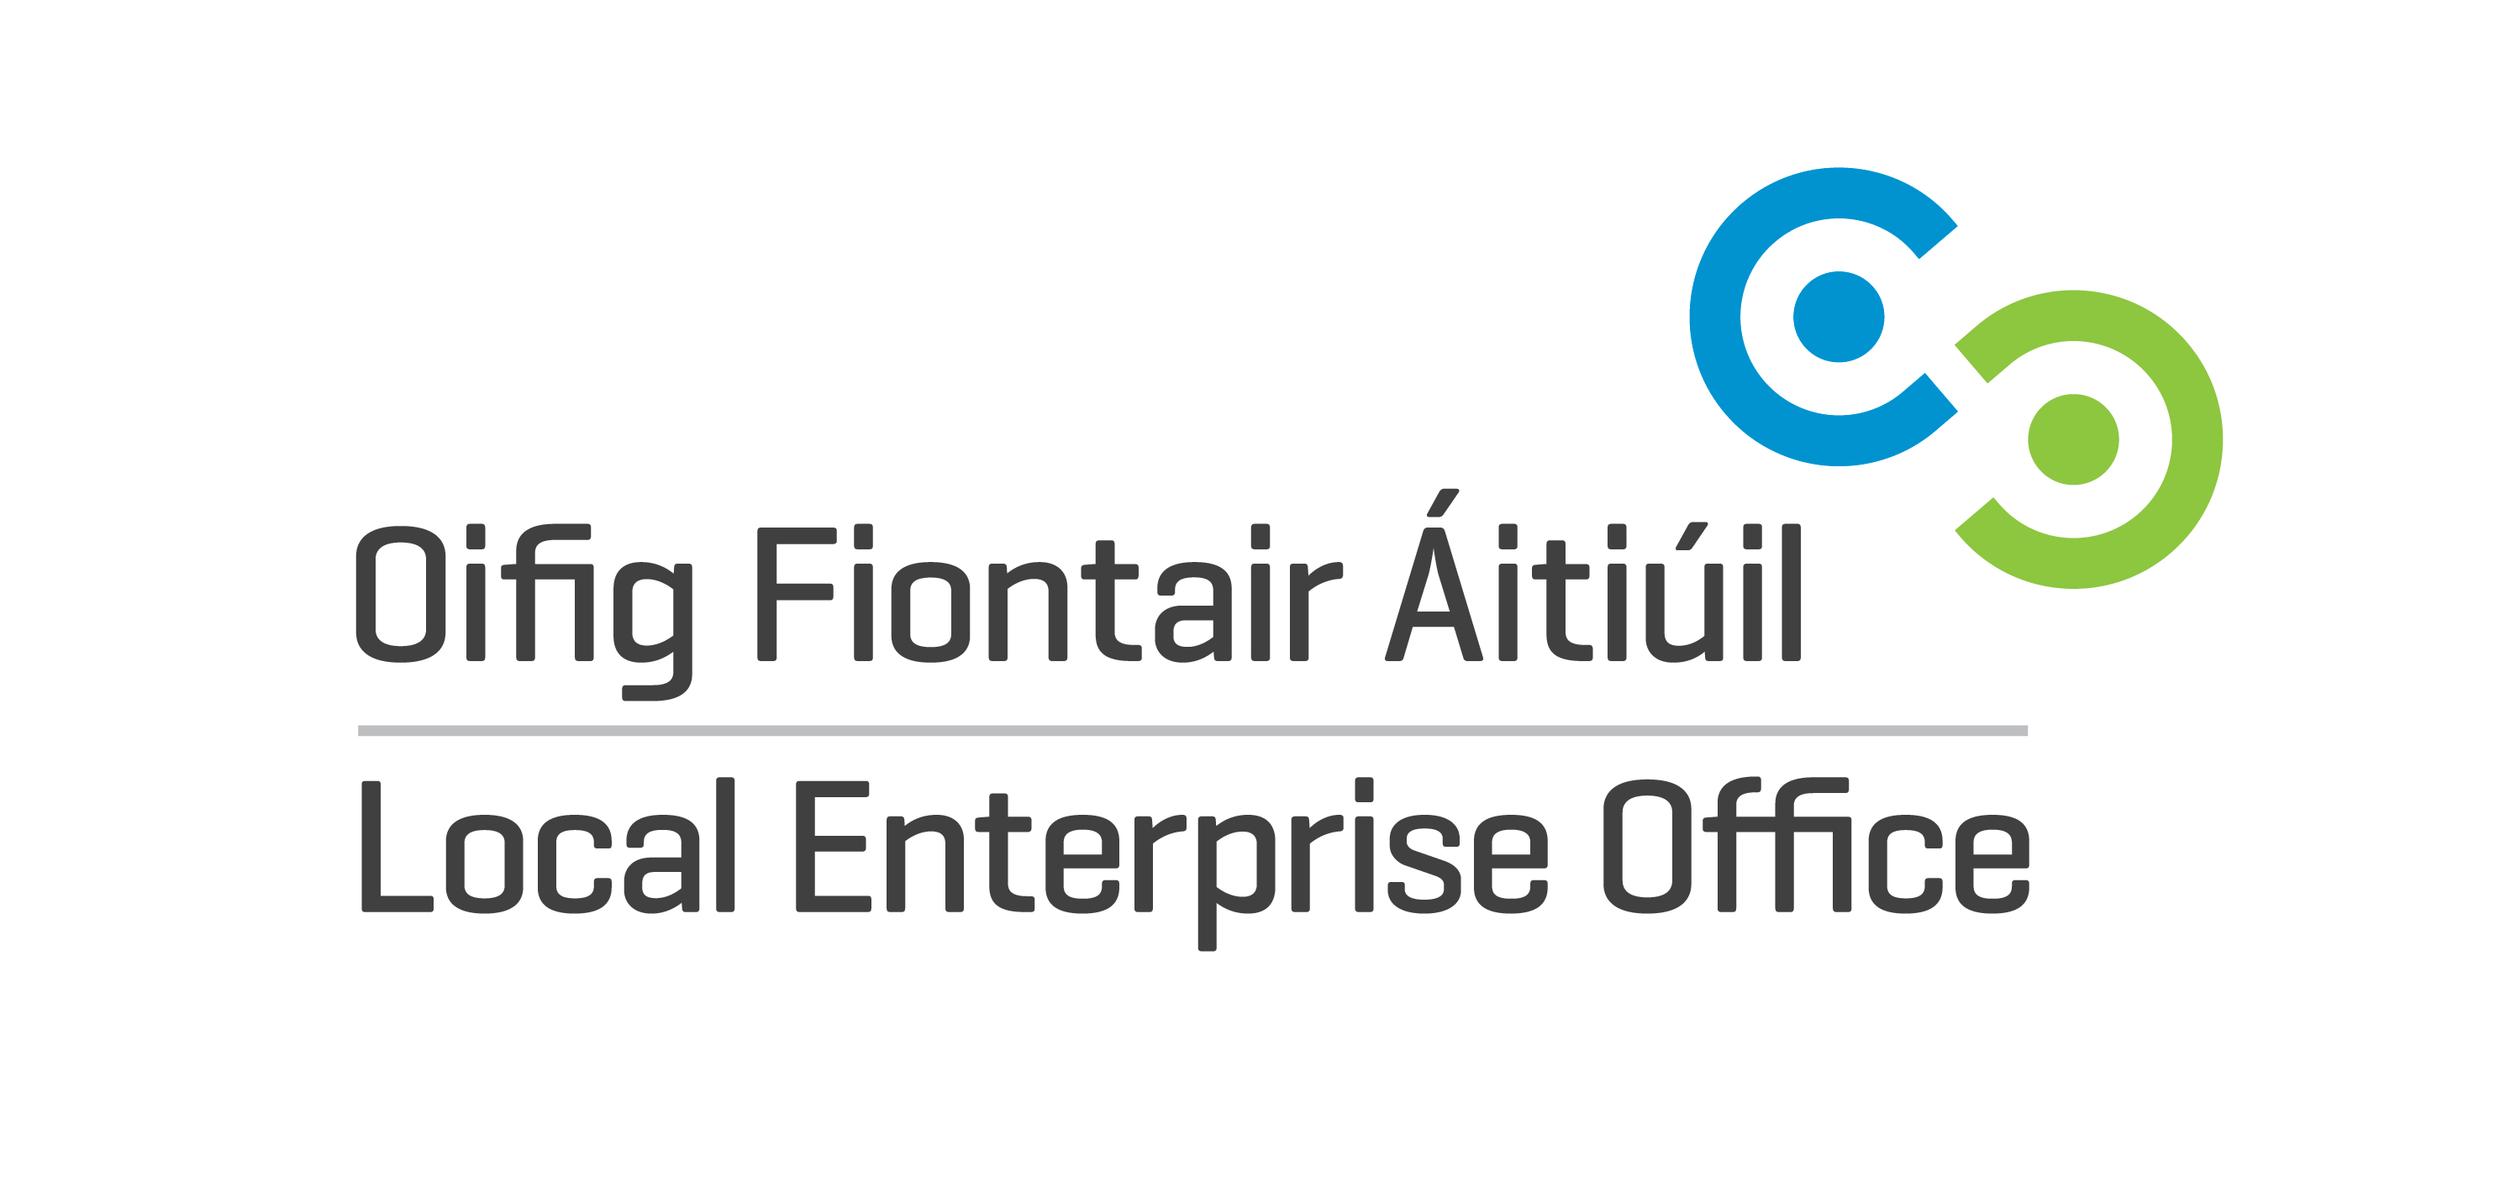 Local-Enterprise-Office-Fingal.png